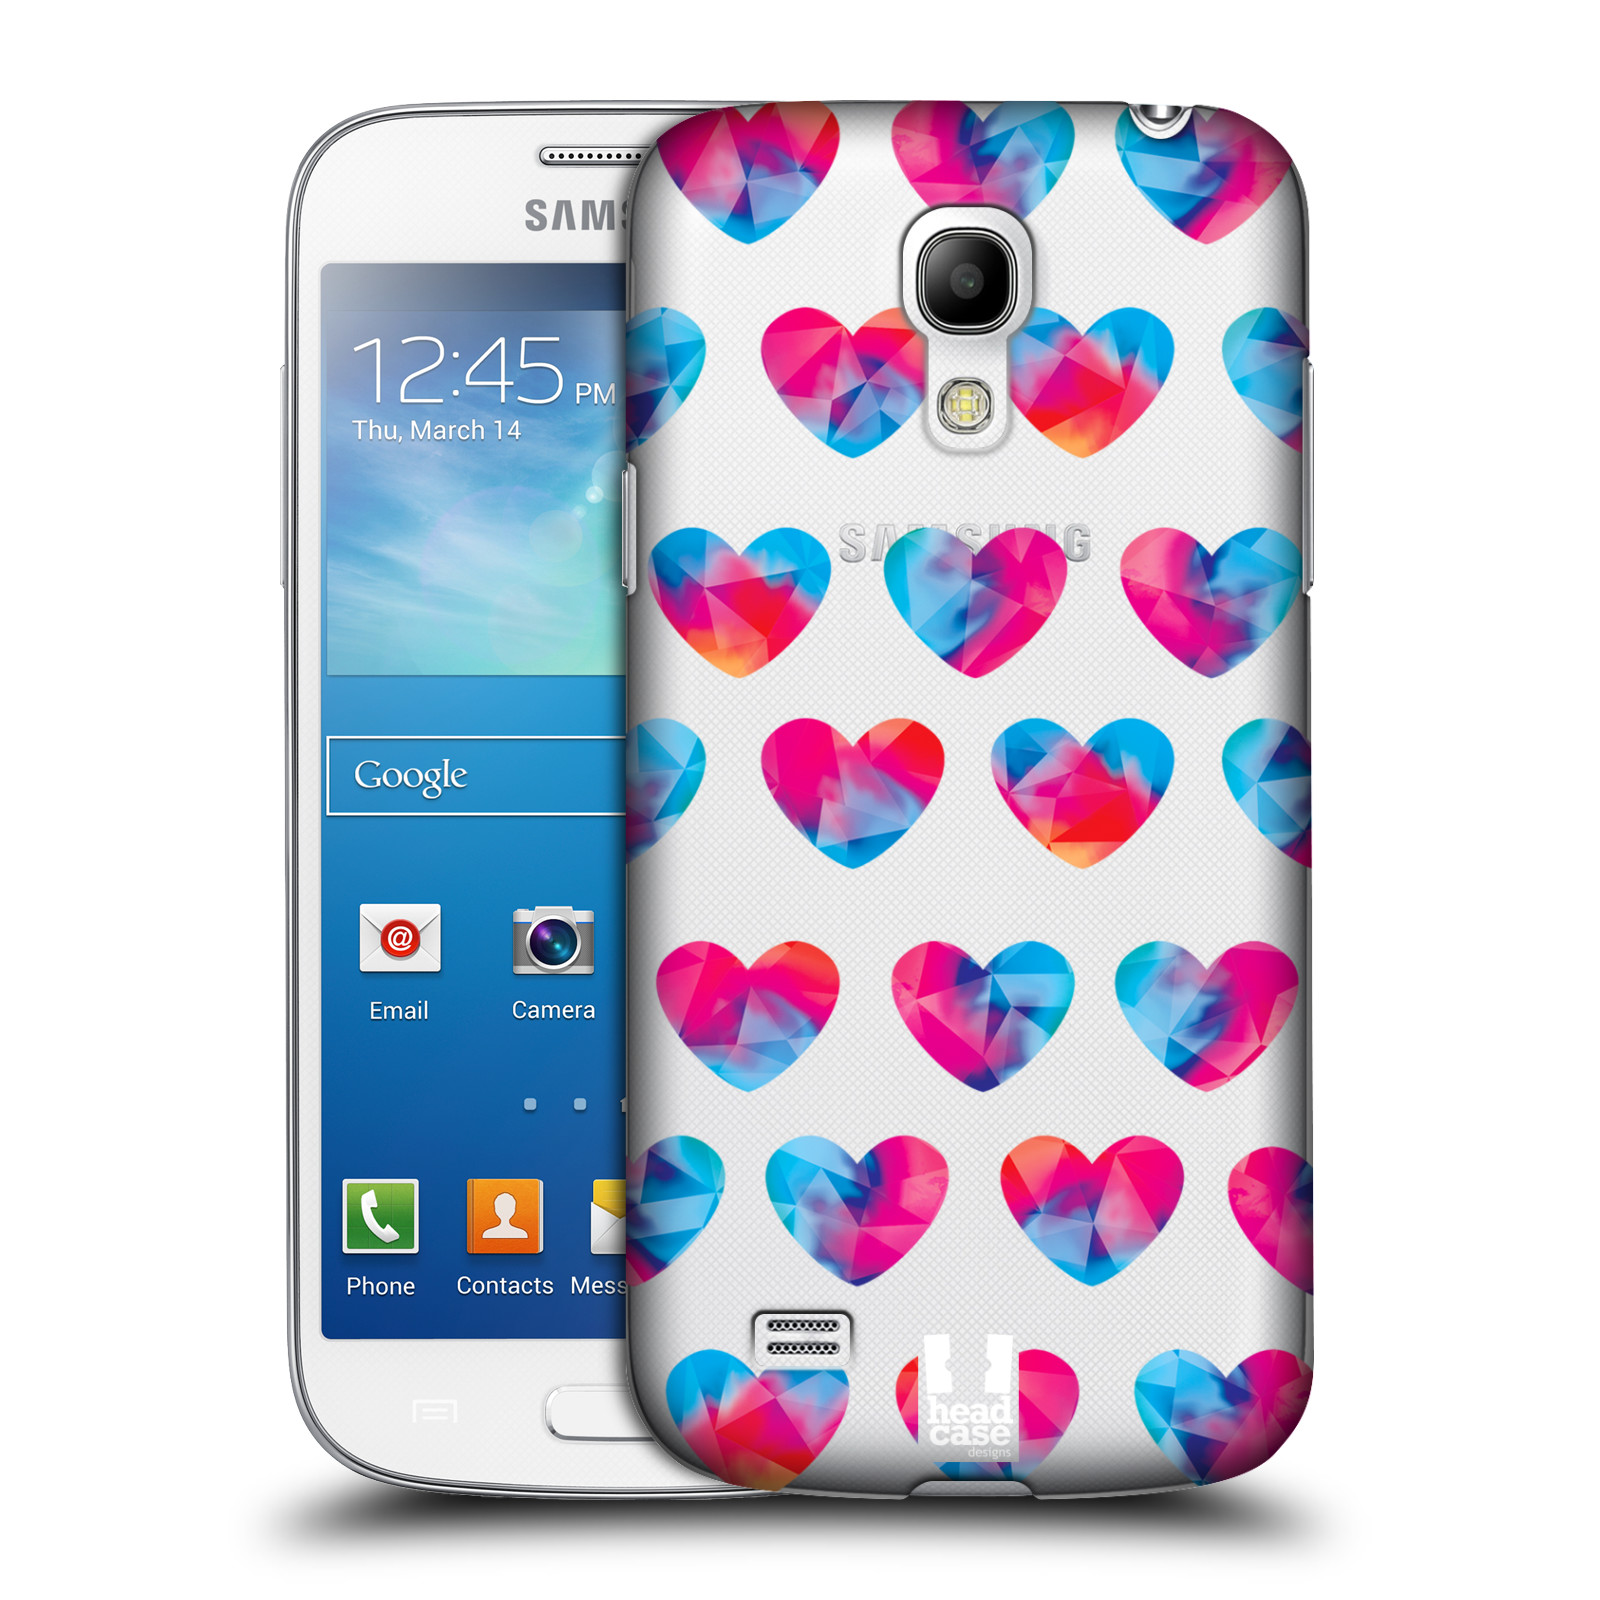 Plastové pouzdro na mobil Samsung Galaxy S4 Mini - Head Case - Srdíčka hrající barvami